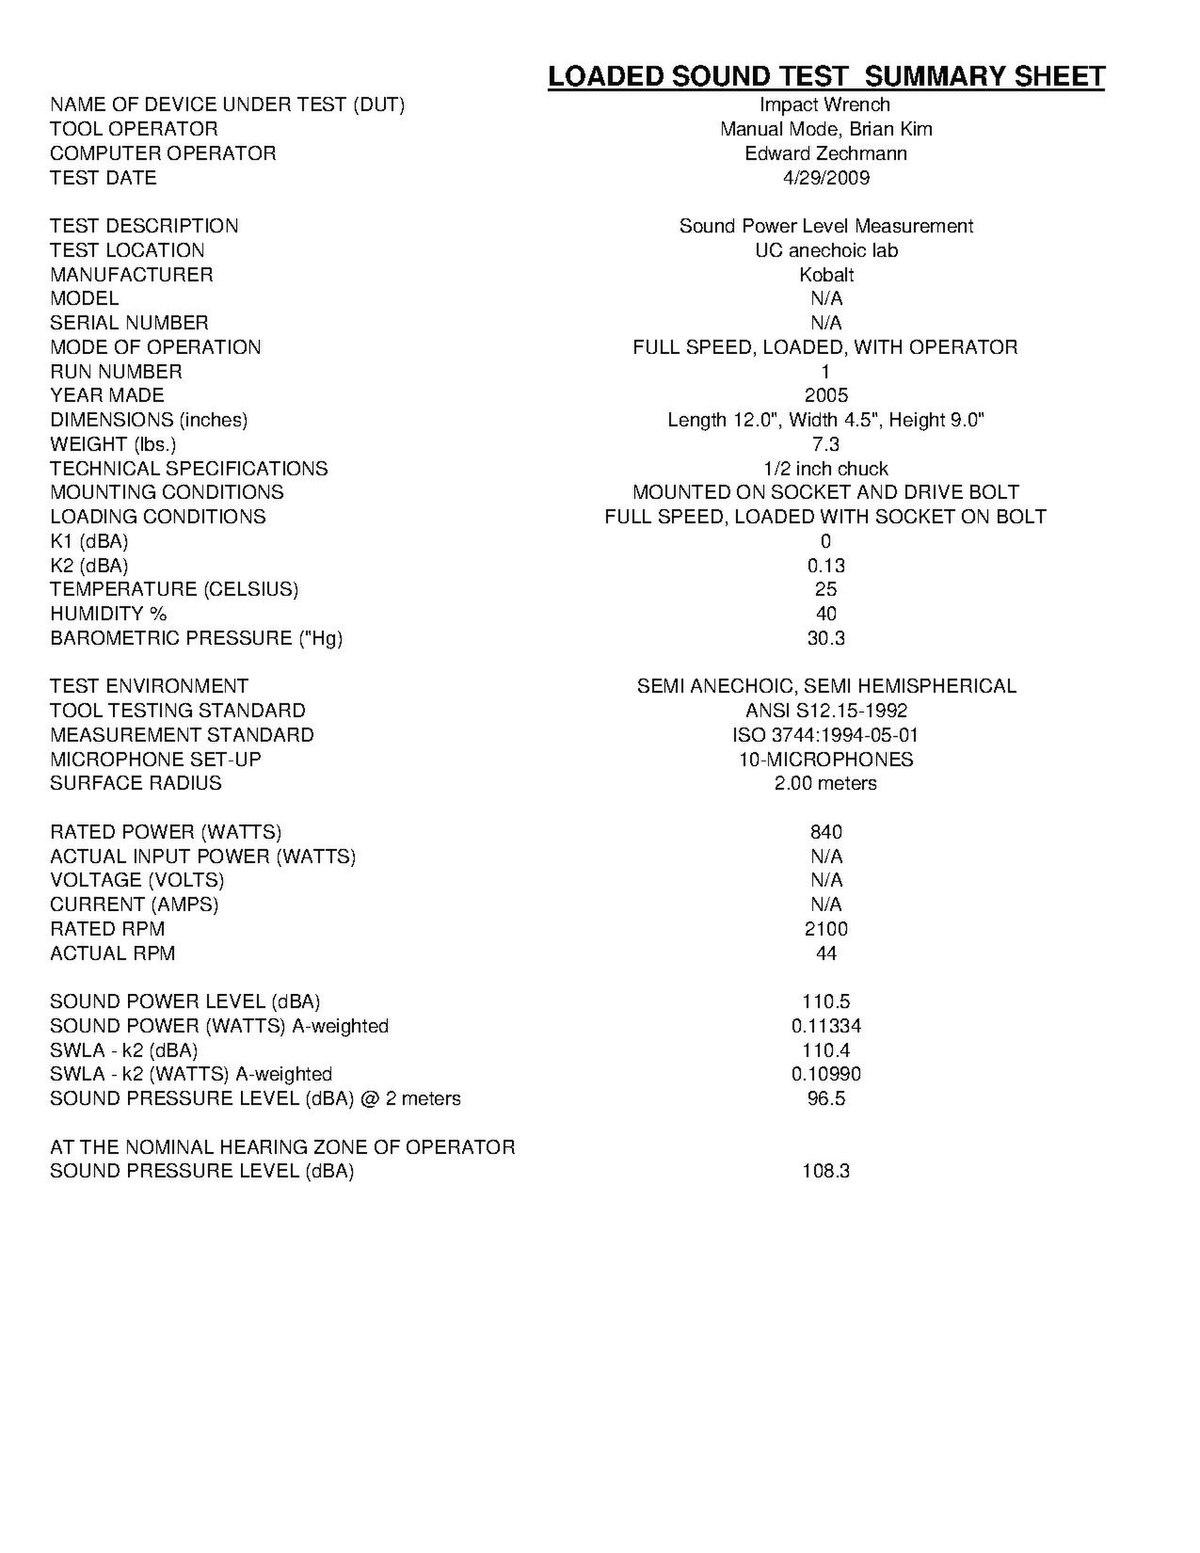 File:Kobalt loaded summary sheet.pdf - Wikimedia Commons